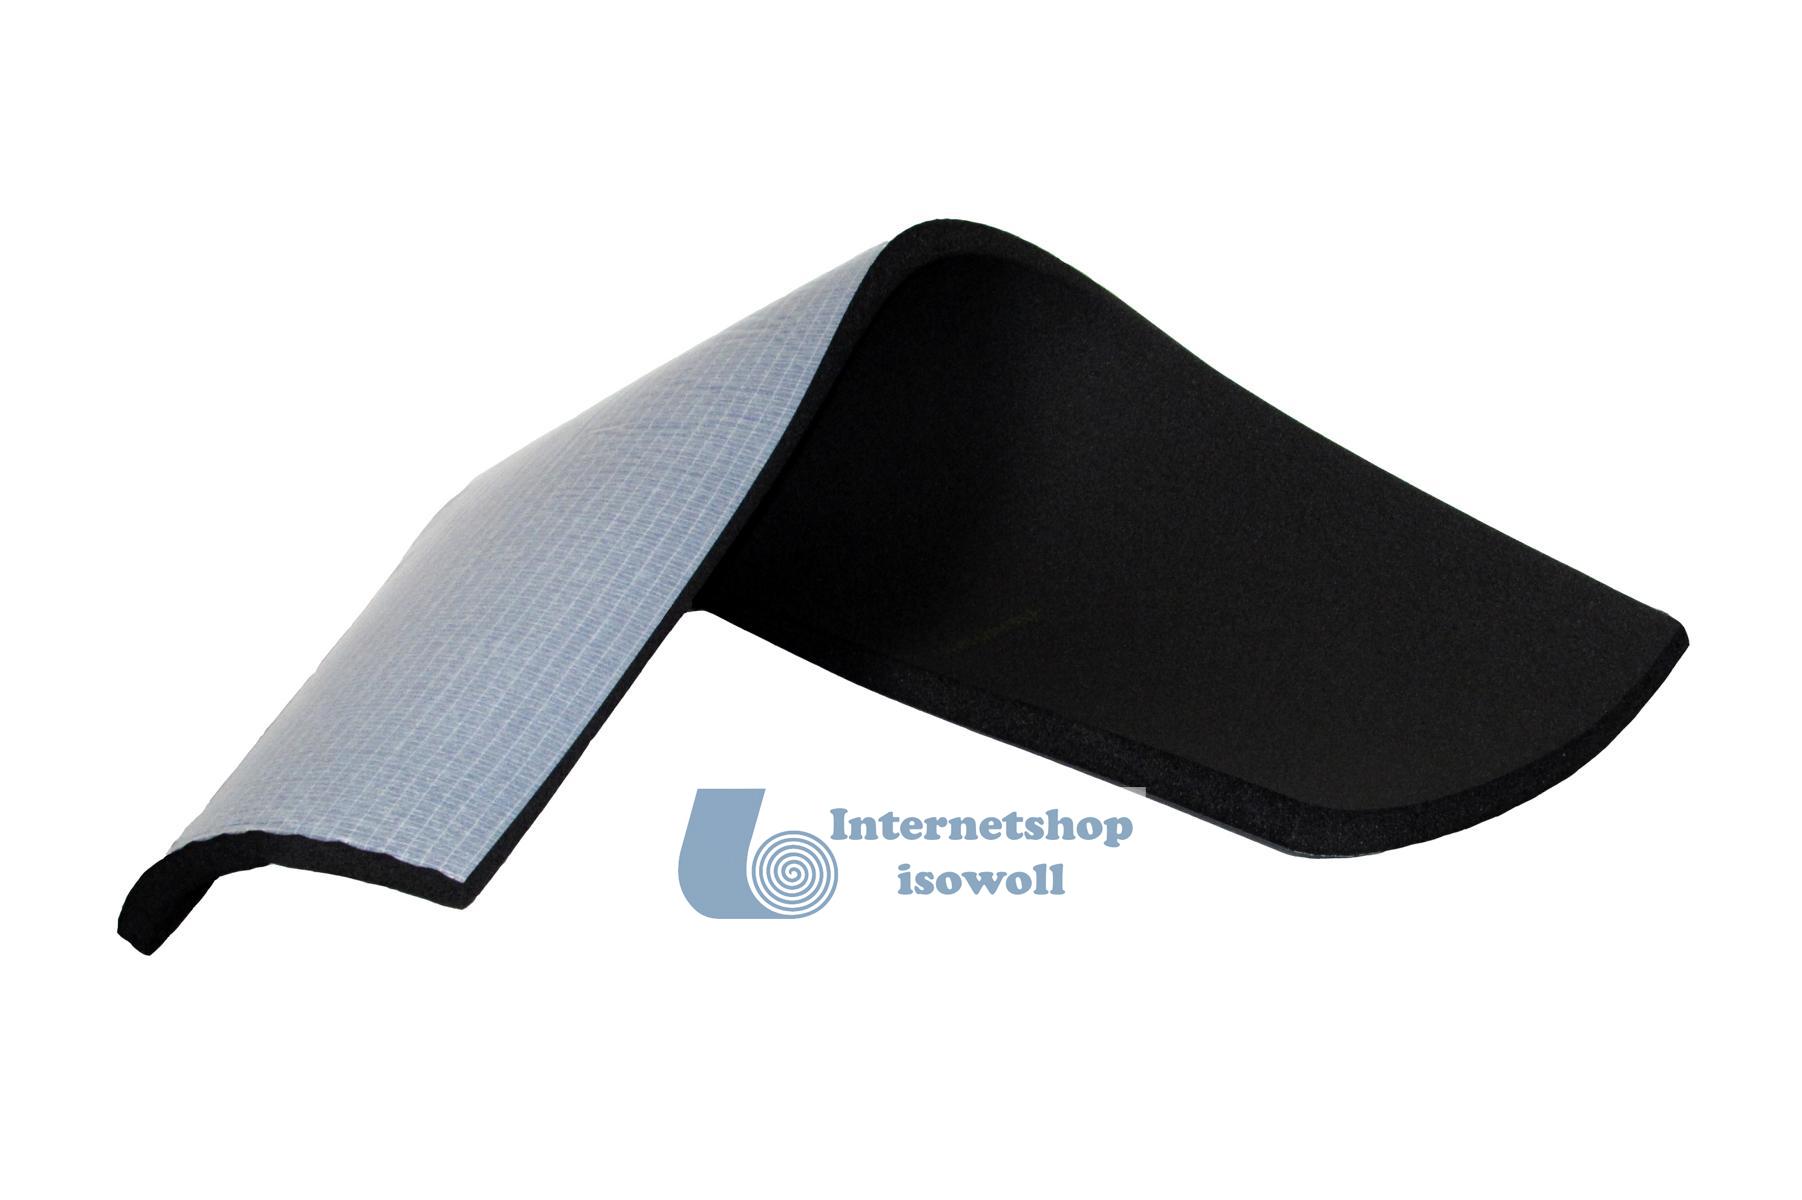 1 qm original armacell af kautschuk platte selbstklebend isowoll onlineshop f r. Black Bedroom Furniture Sets. Home Design Ideas